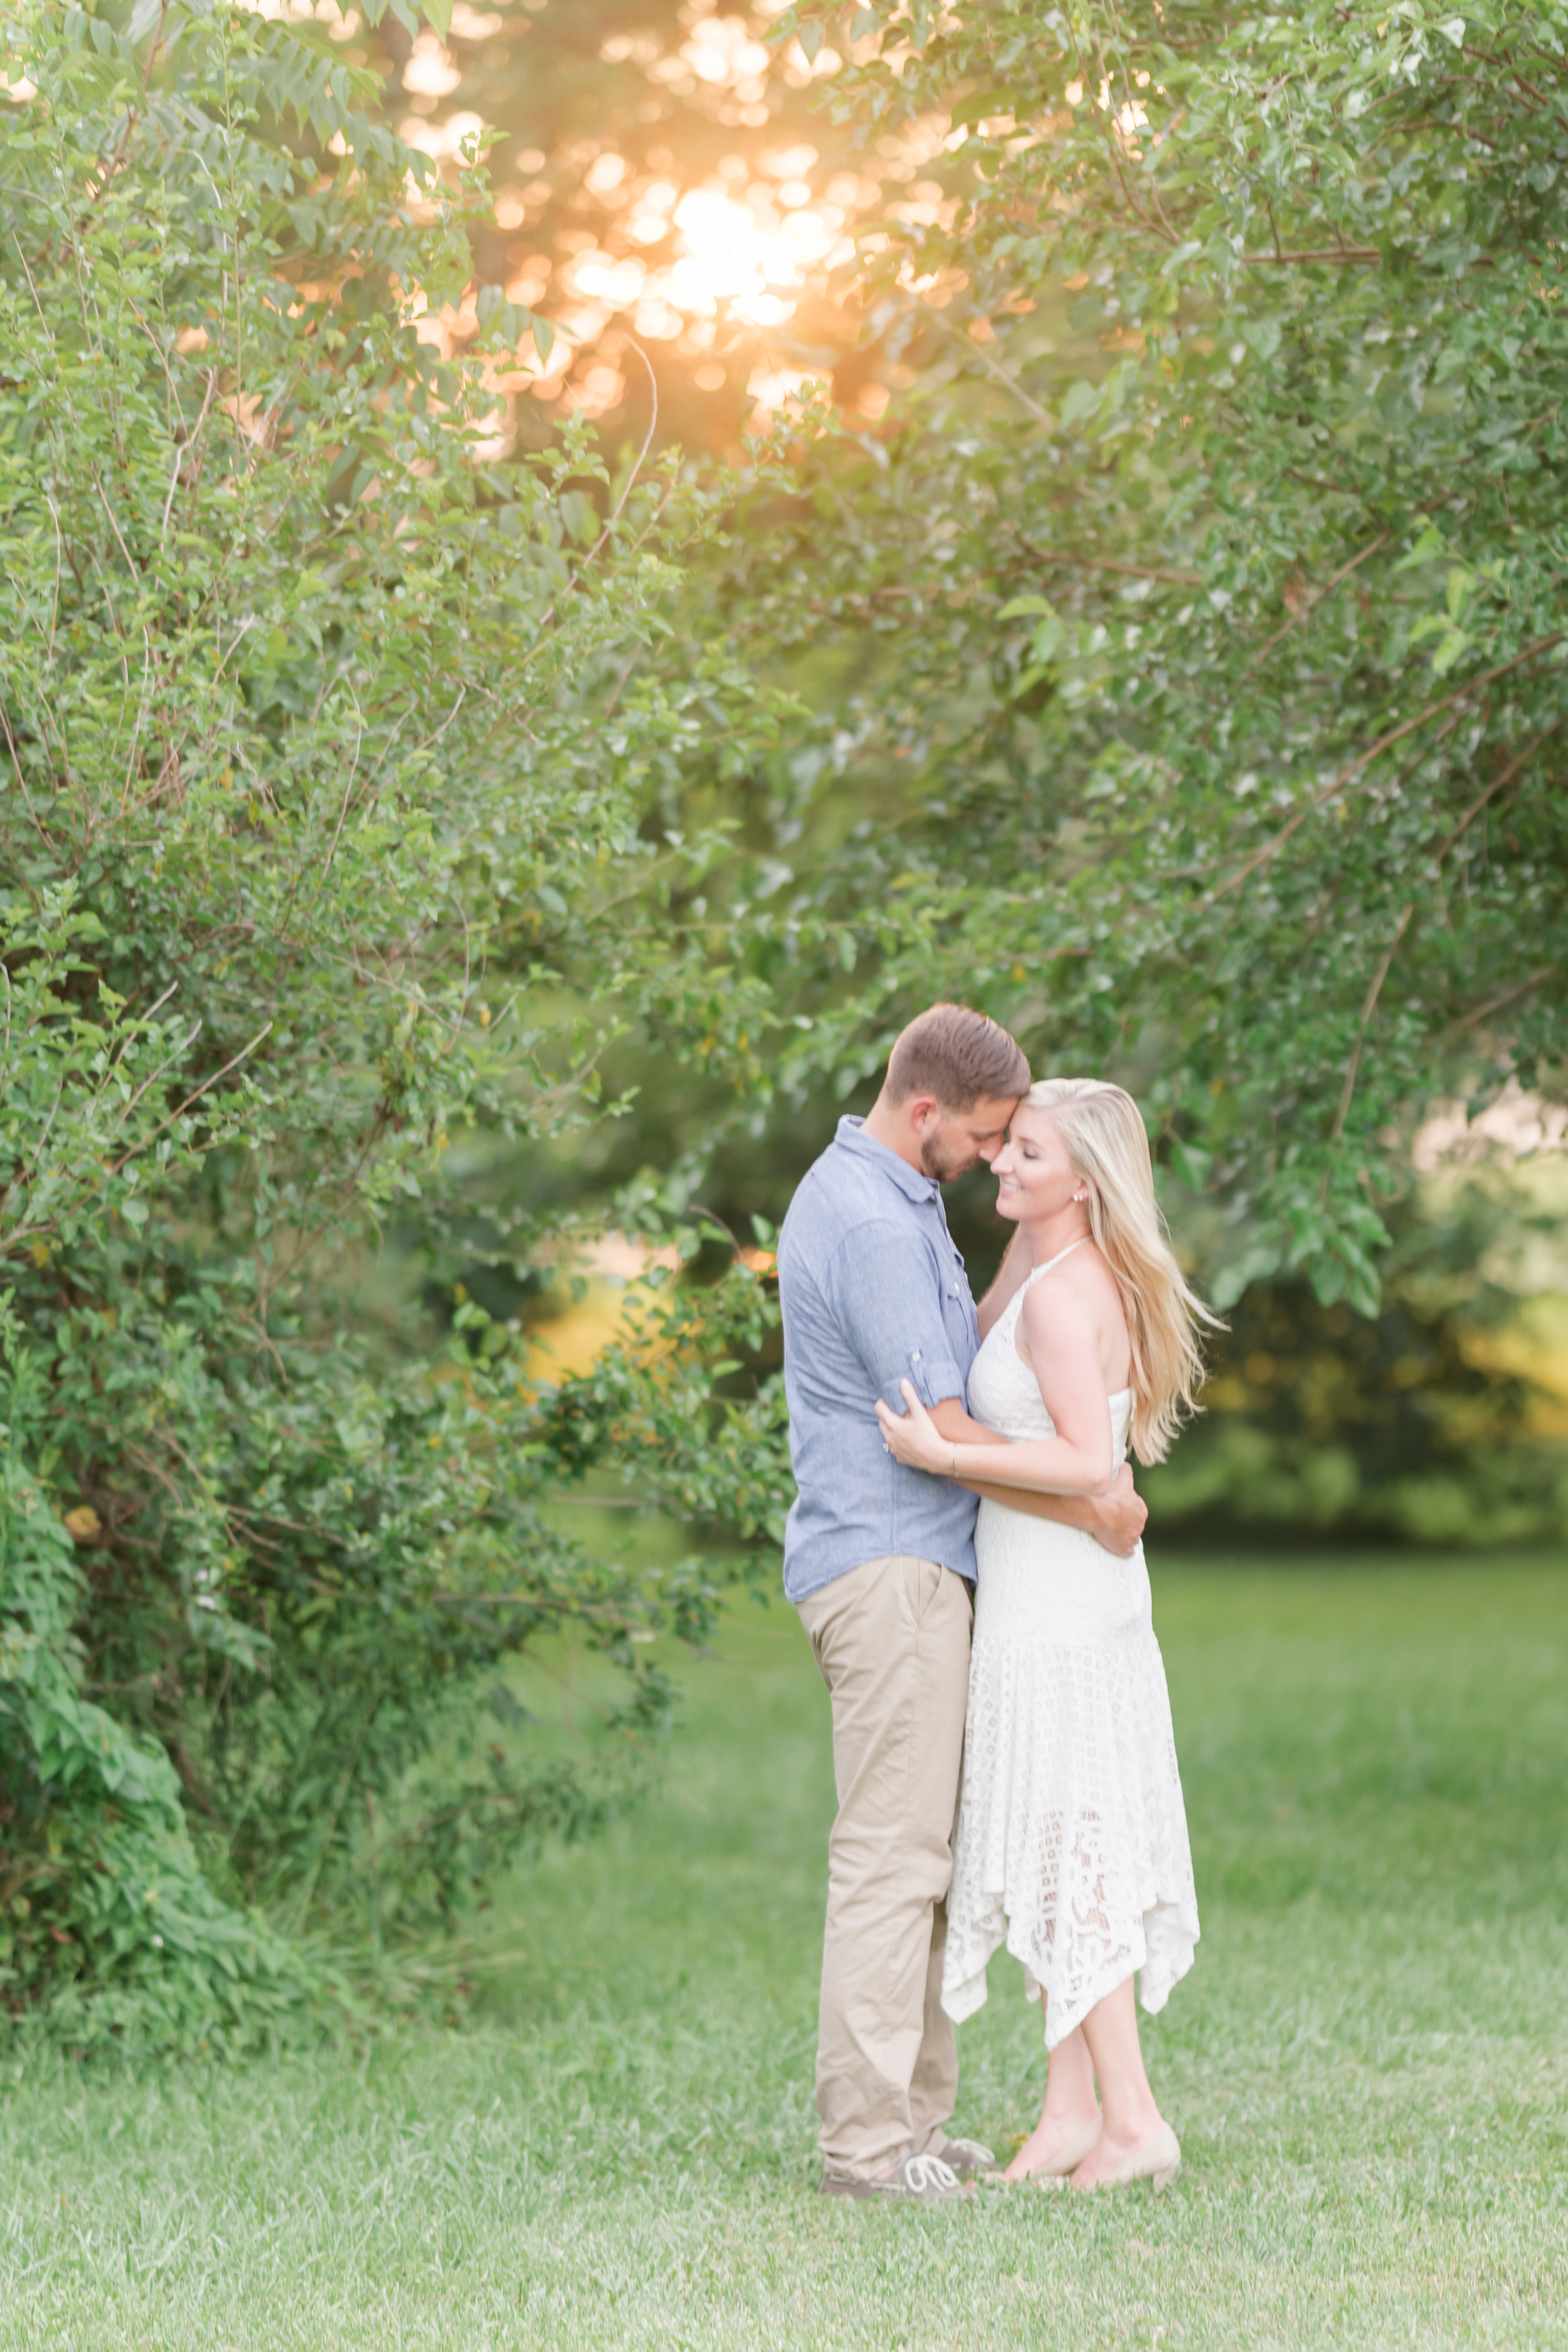 Best Engagement Session Locations Indianapolis Southeastway Park